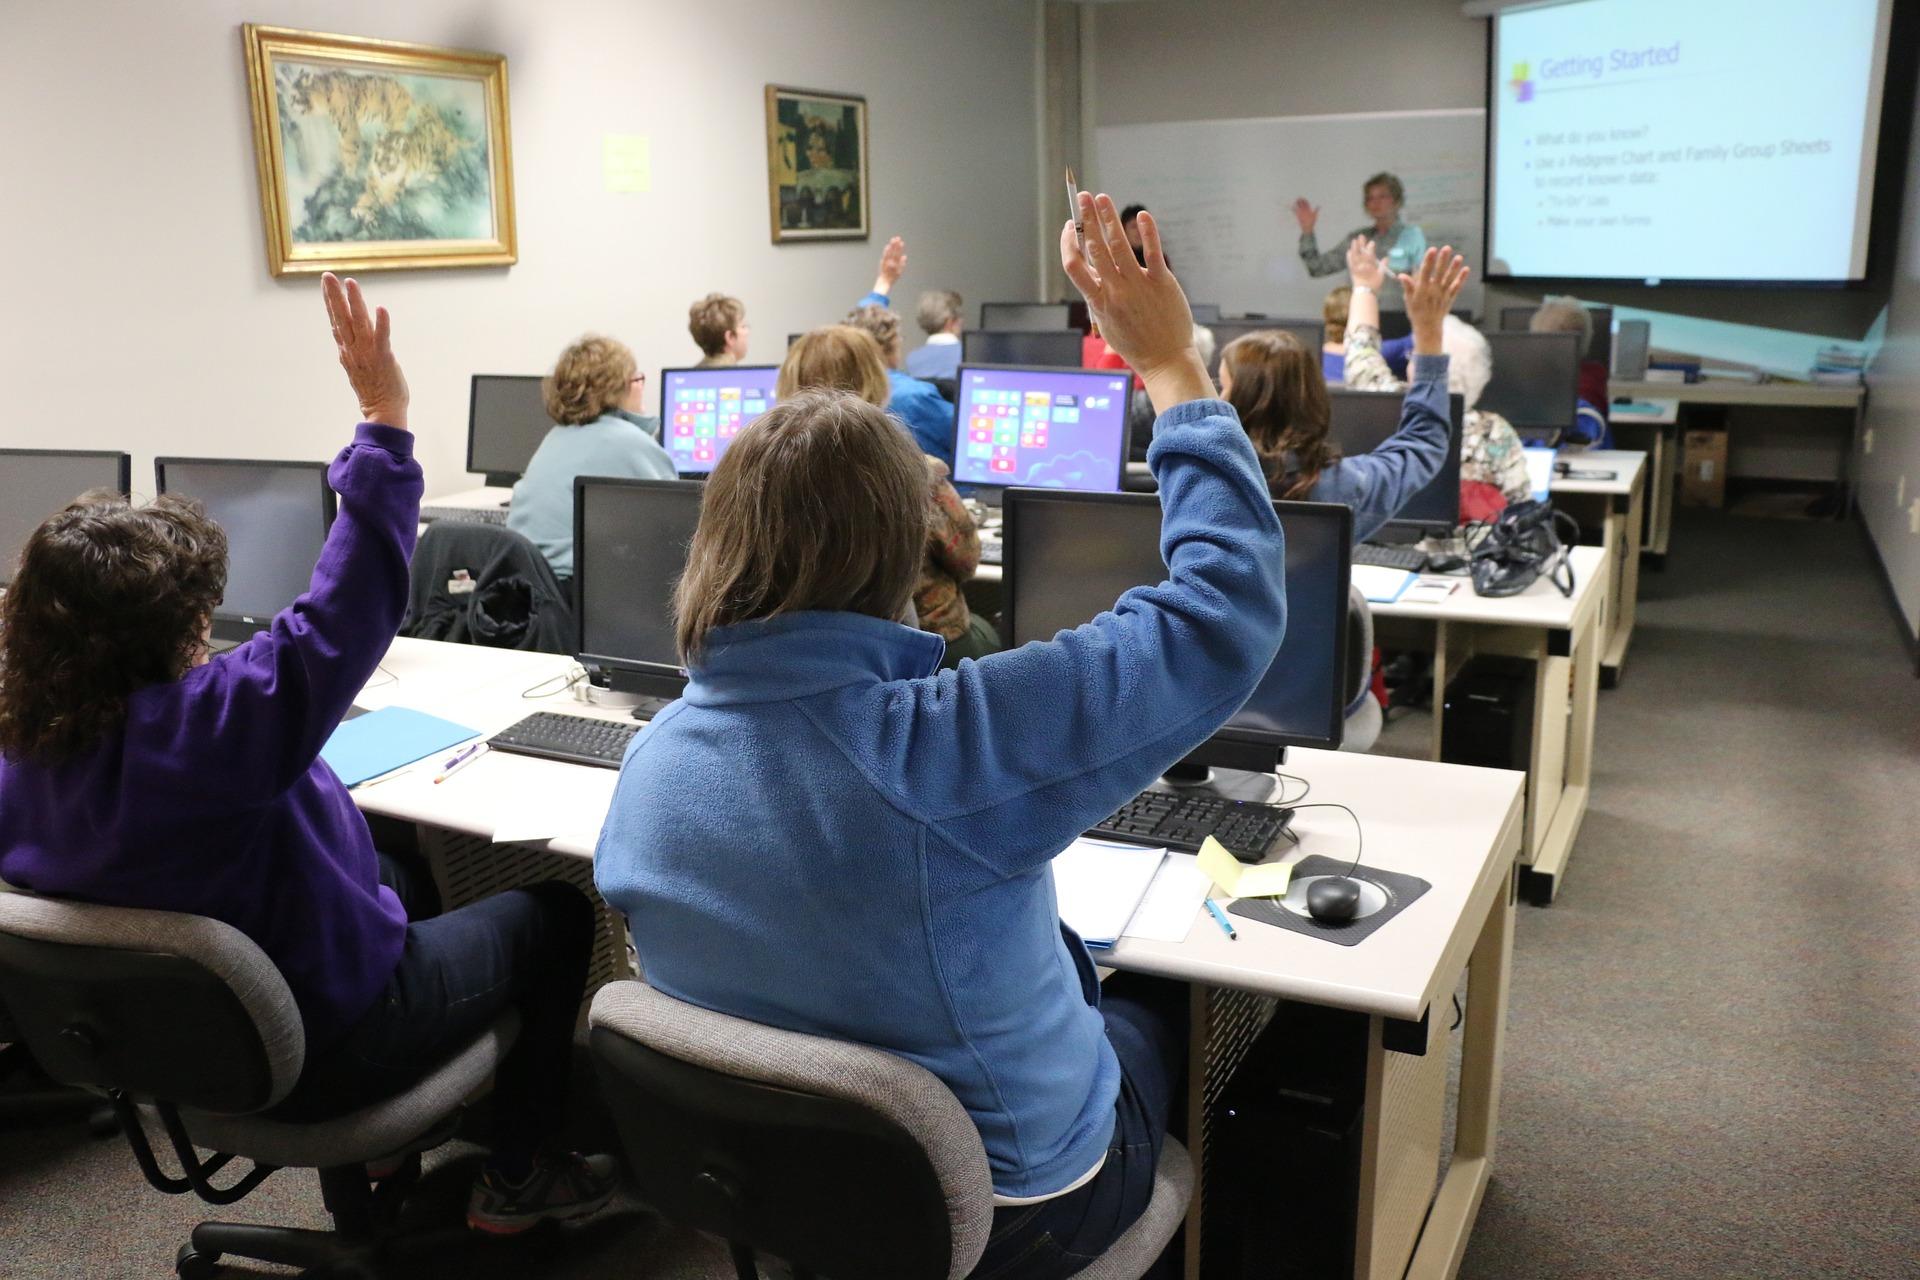 classroom-1189988_1920.jpg